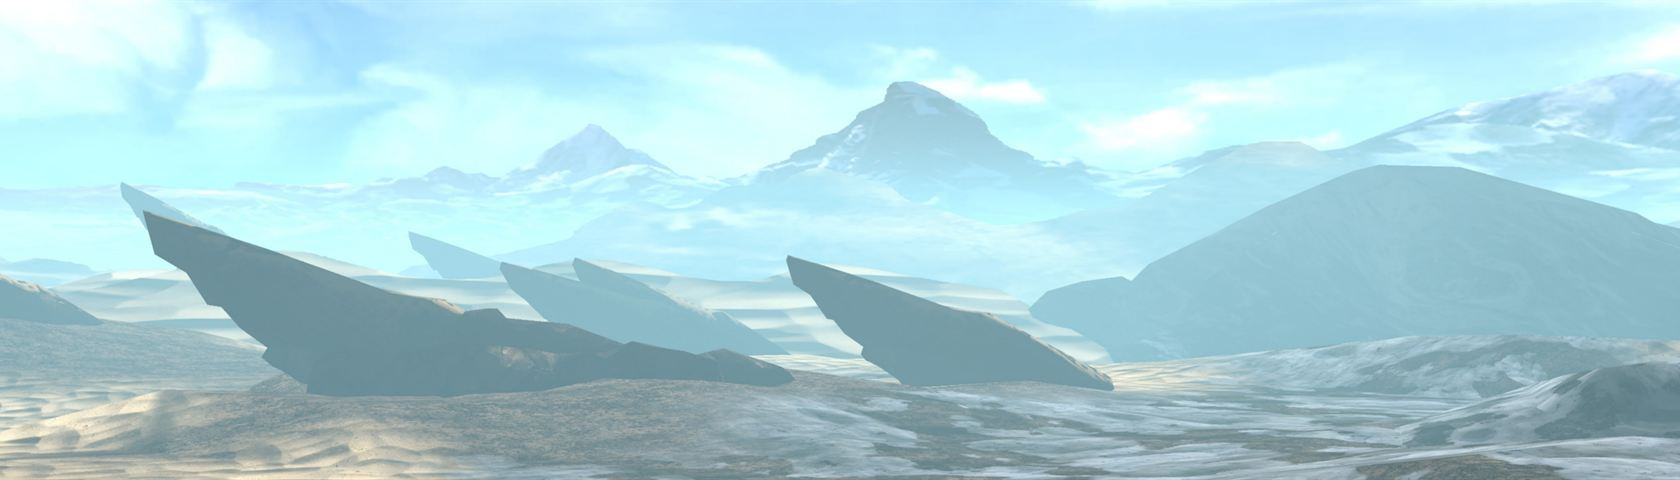 The Dust Morning Landscape